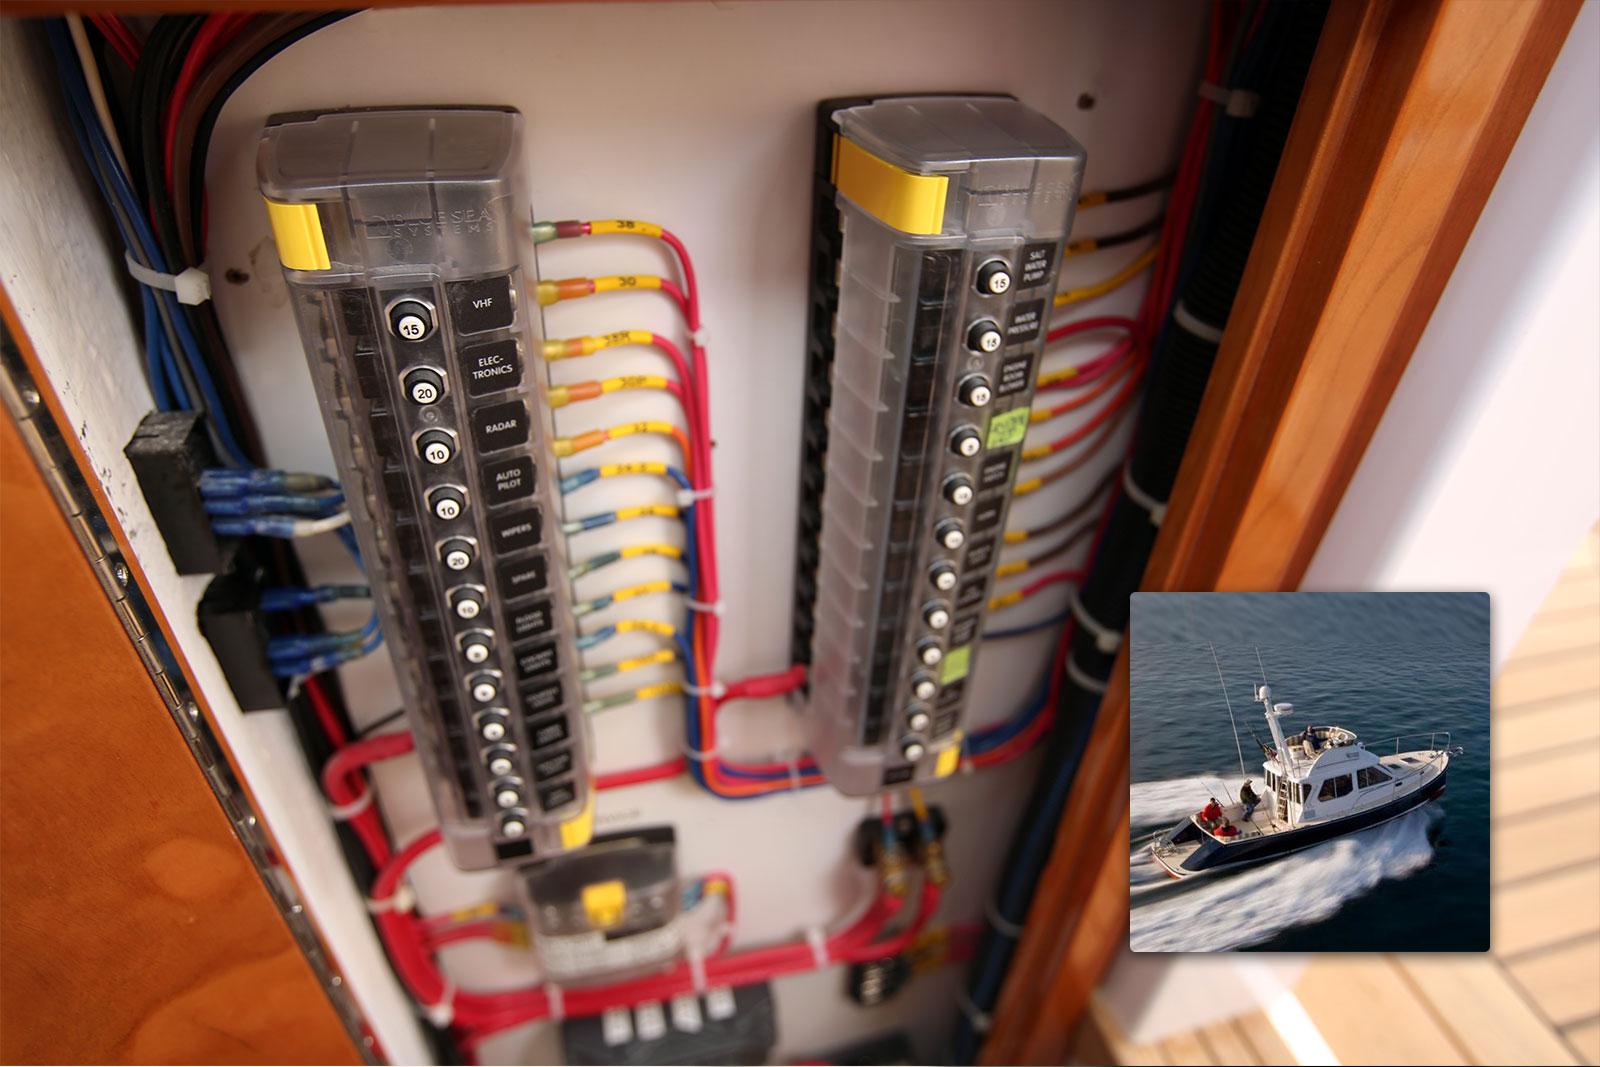 St Clb Circuit Breaker Block 12 Independent Circuits Blue Sea Wizard Download Full Free Breakers Blocks